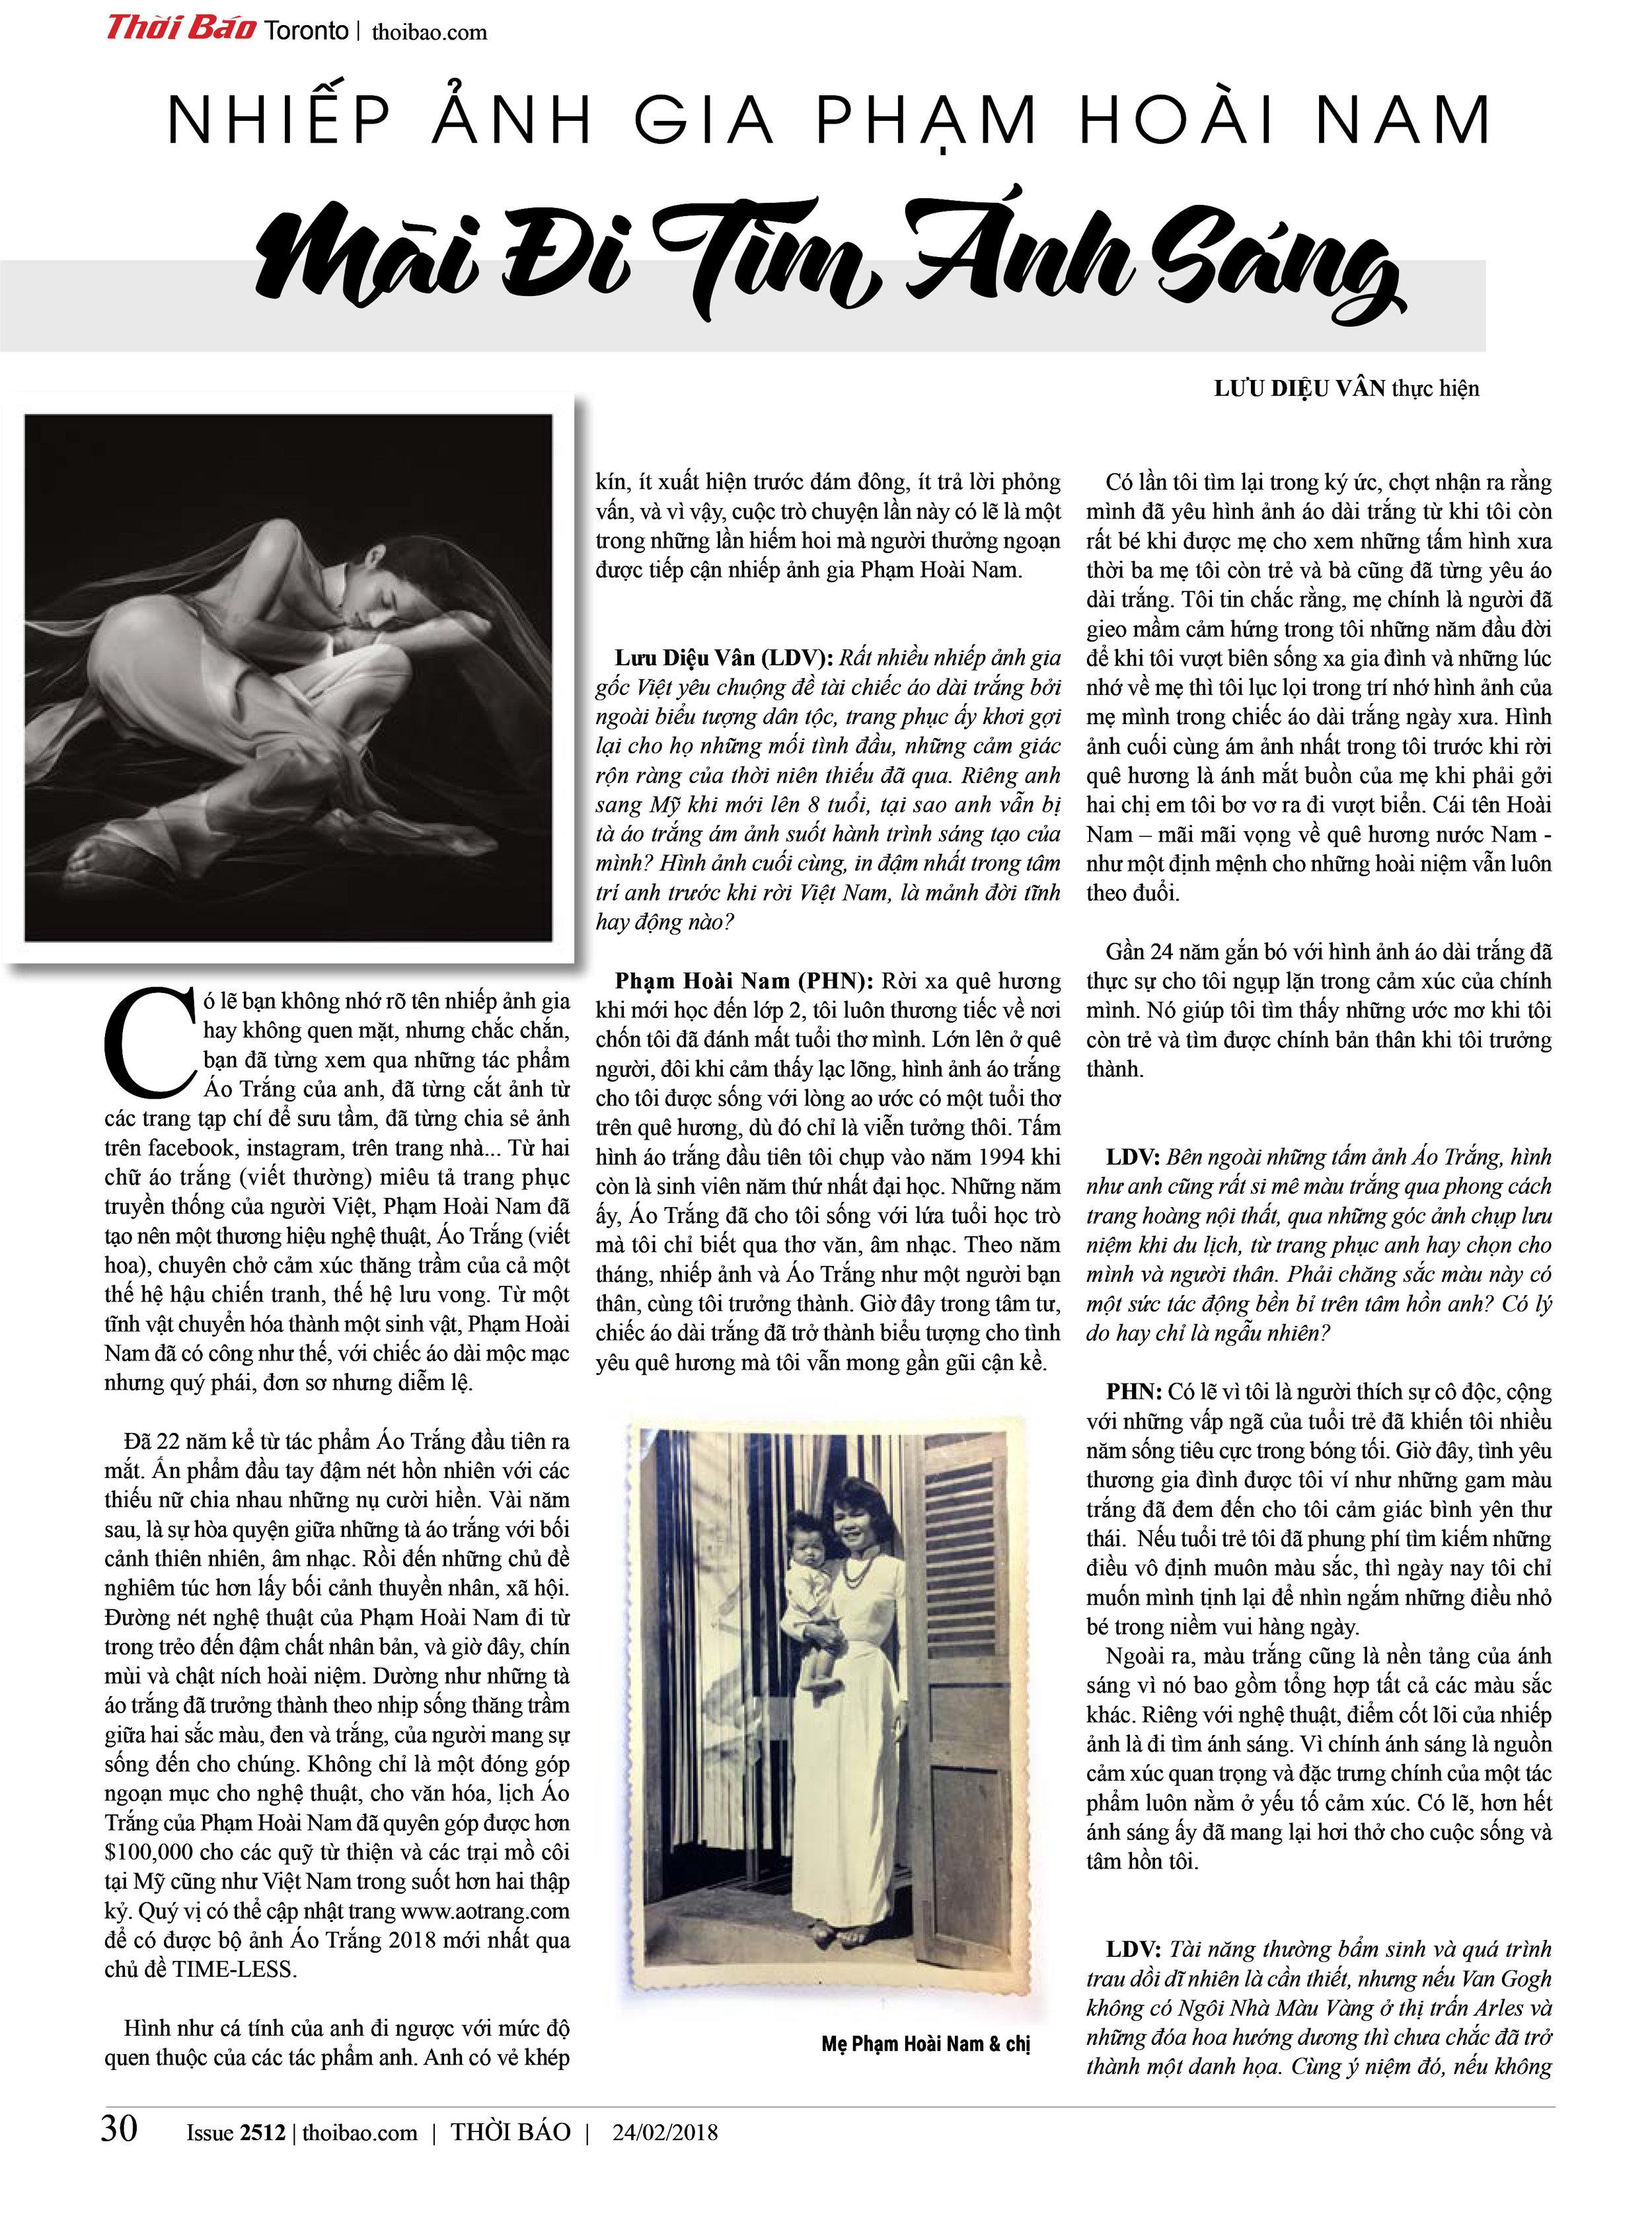 TB7-2512-Pham-Hoai-Nam-interview 1.jpg